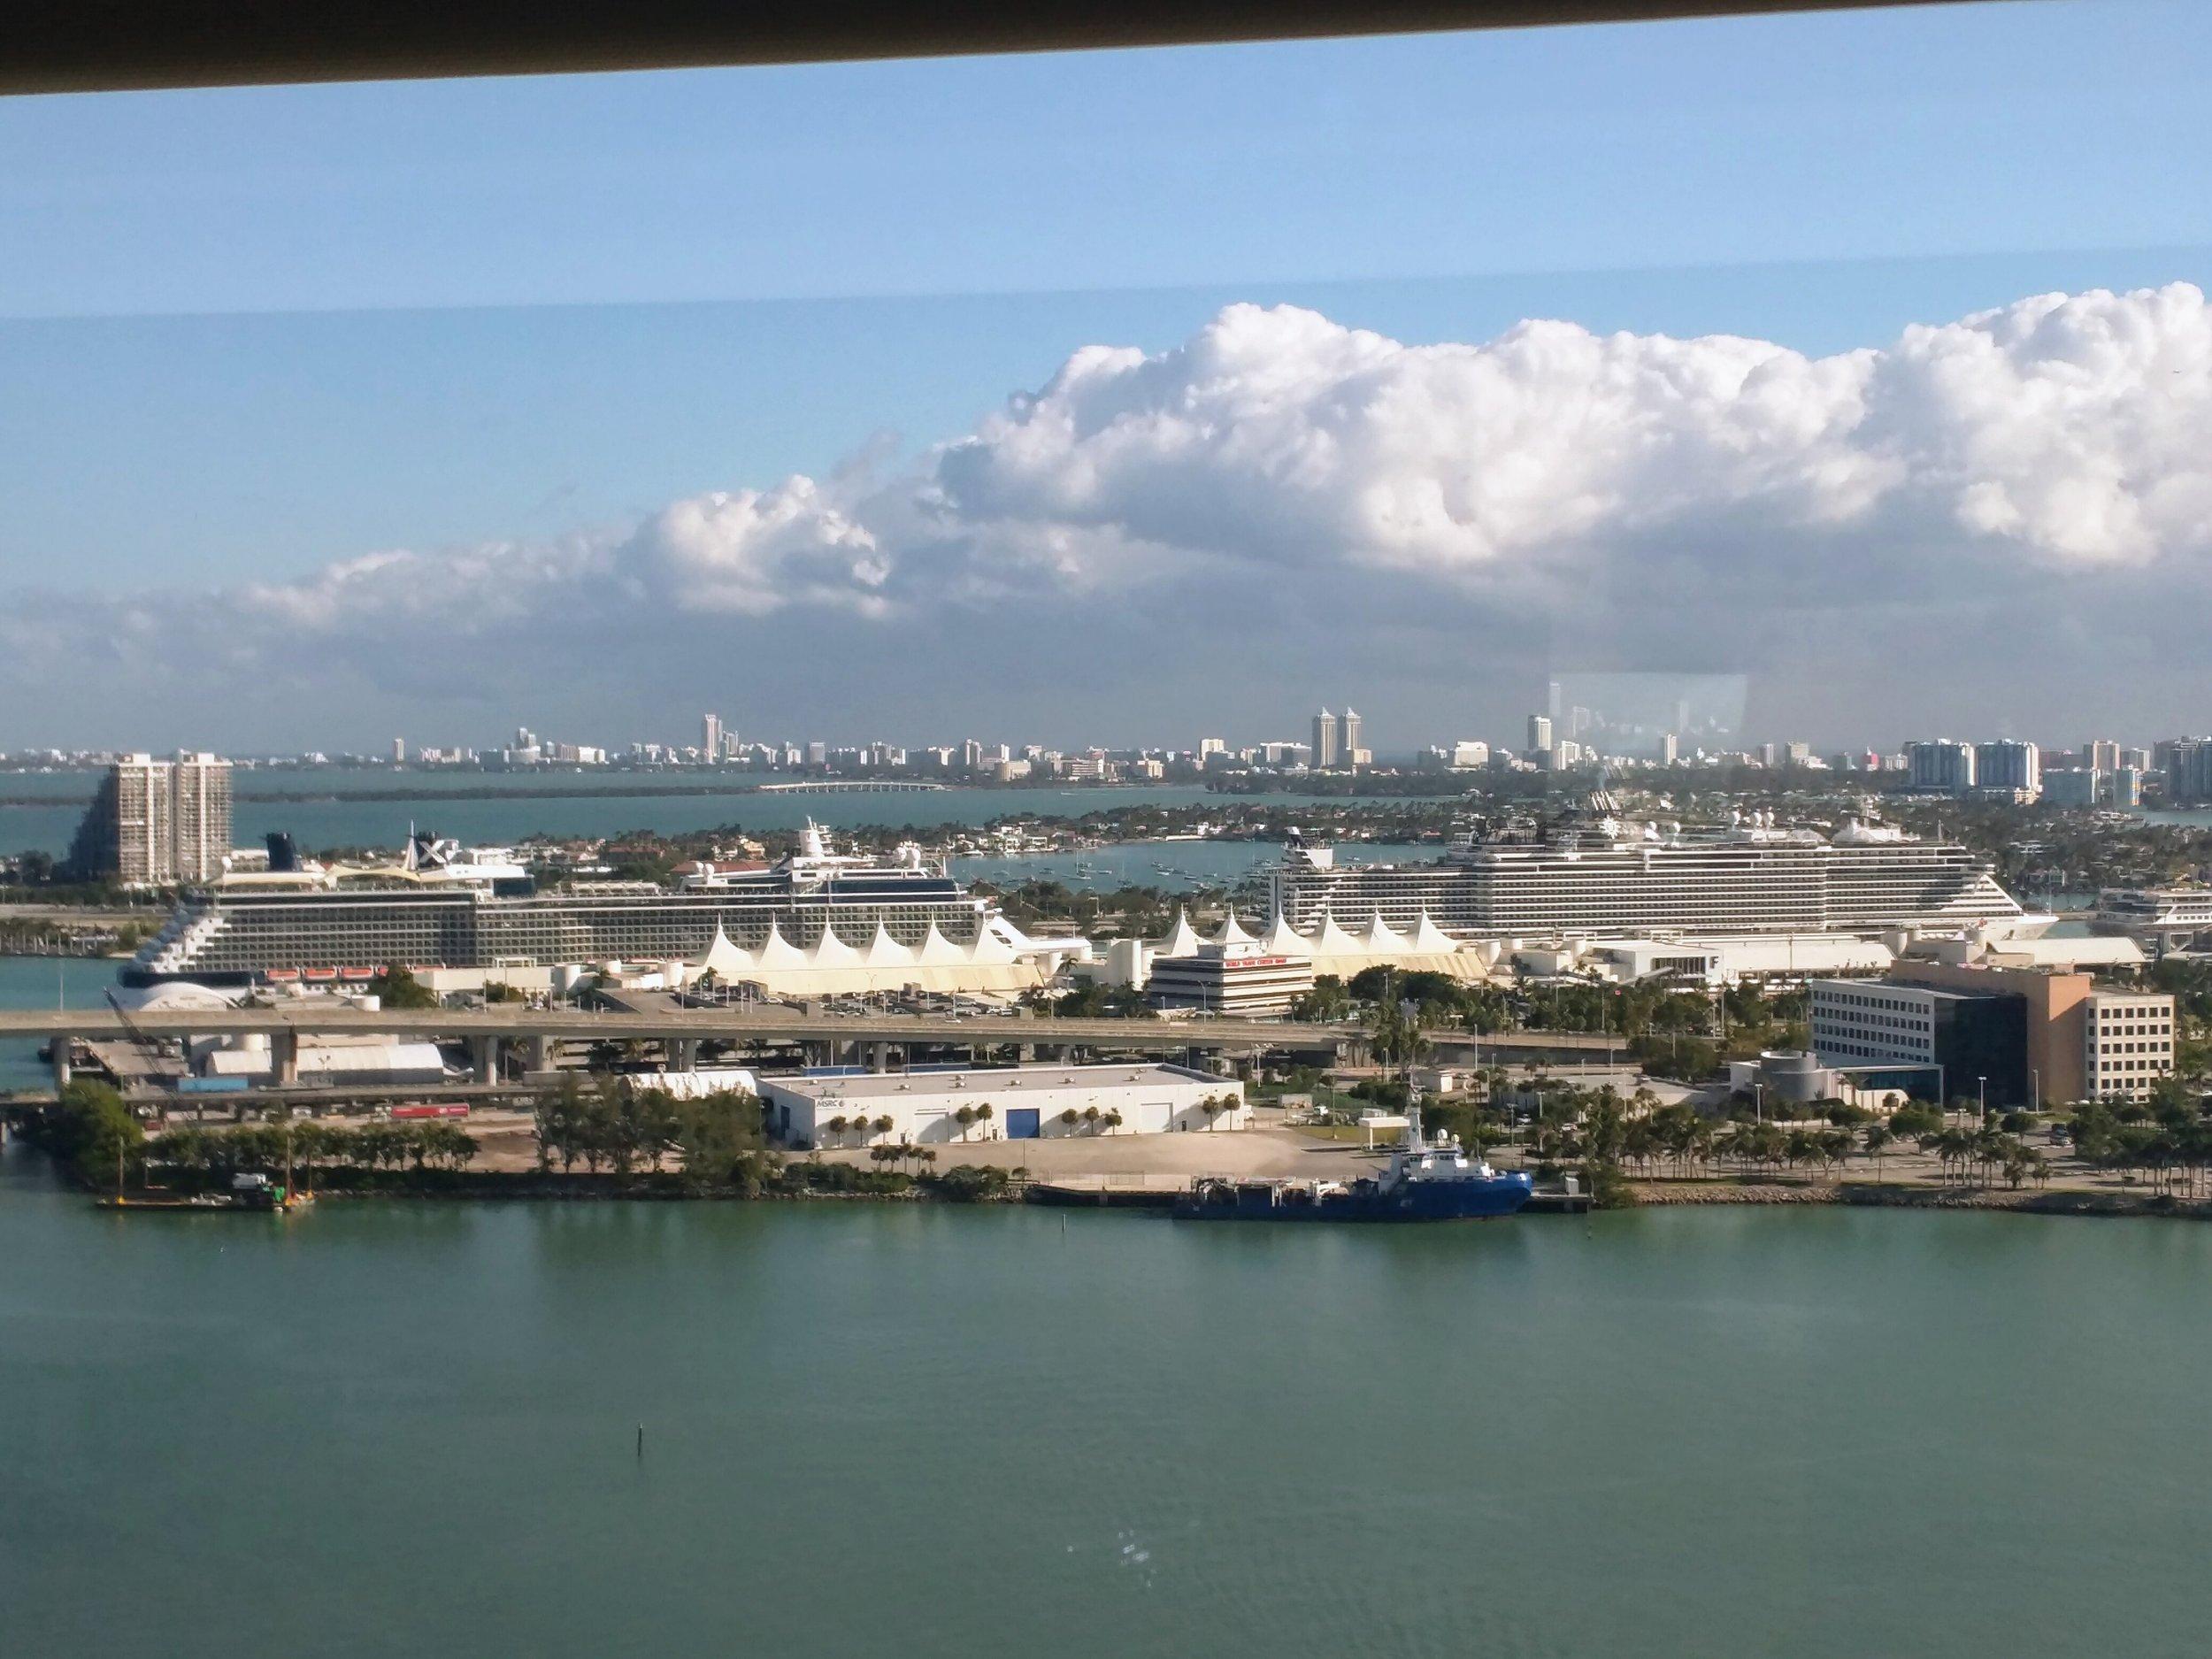 Cruise Terminal F